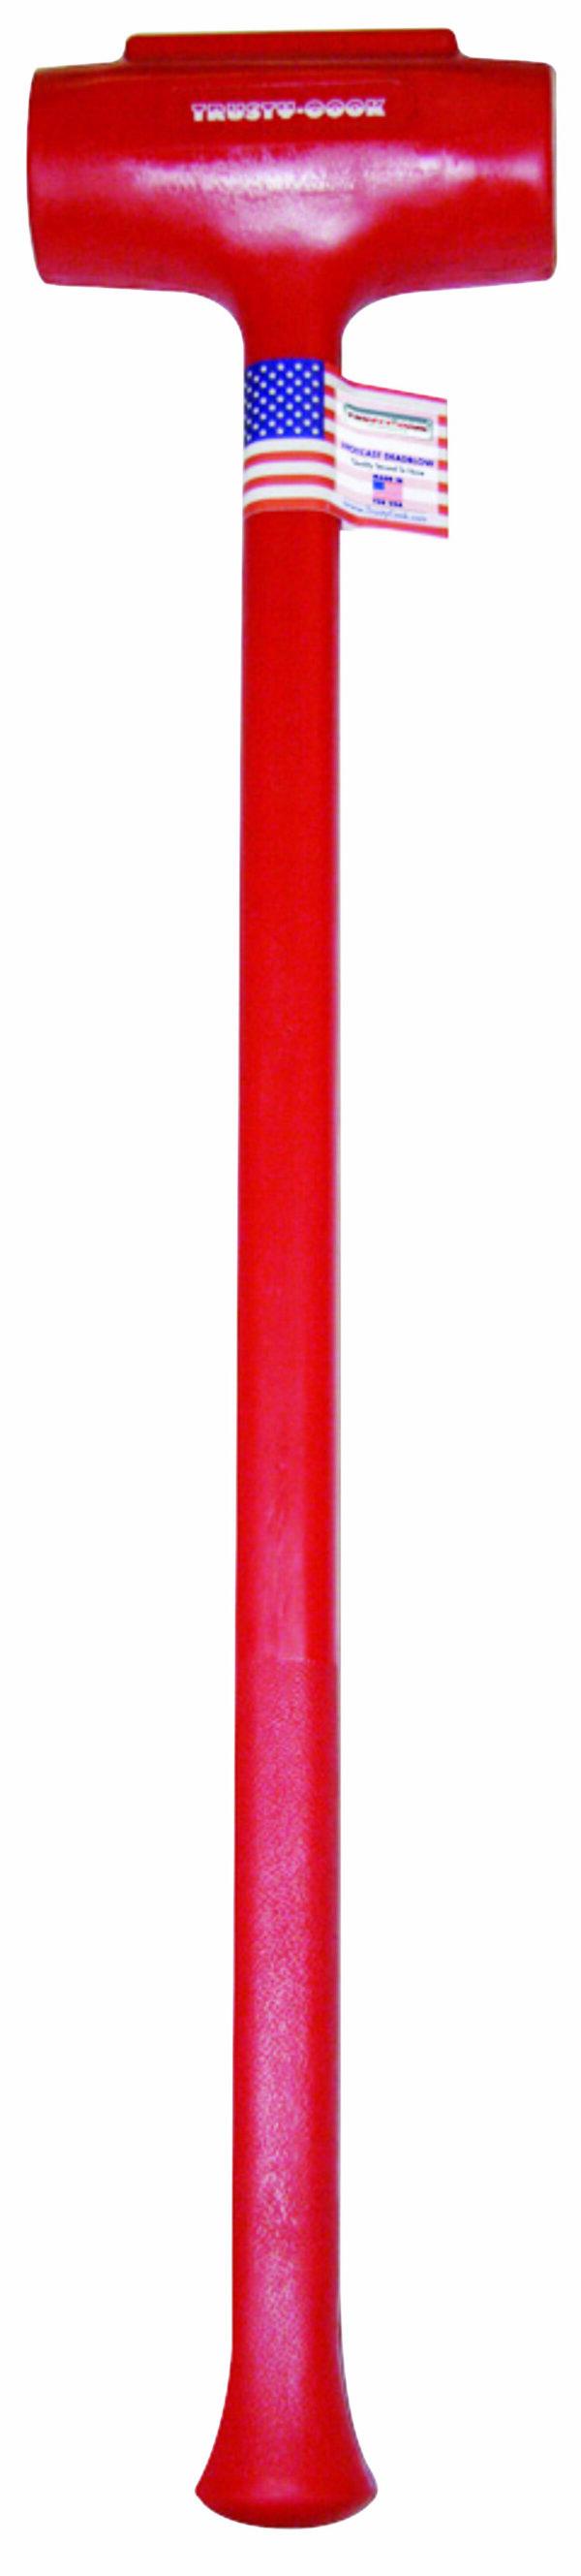 192 oz. Soft Face Polyurethane Dead Blow Sledge Hammer